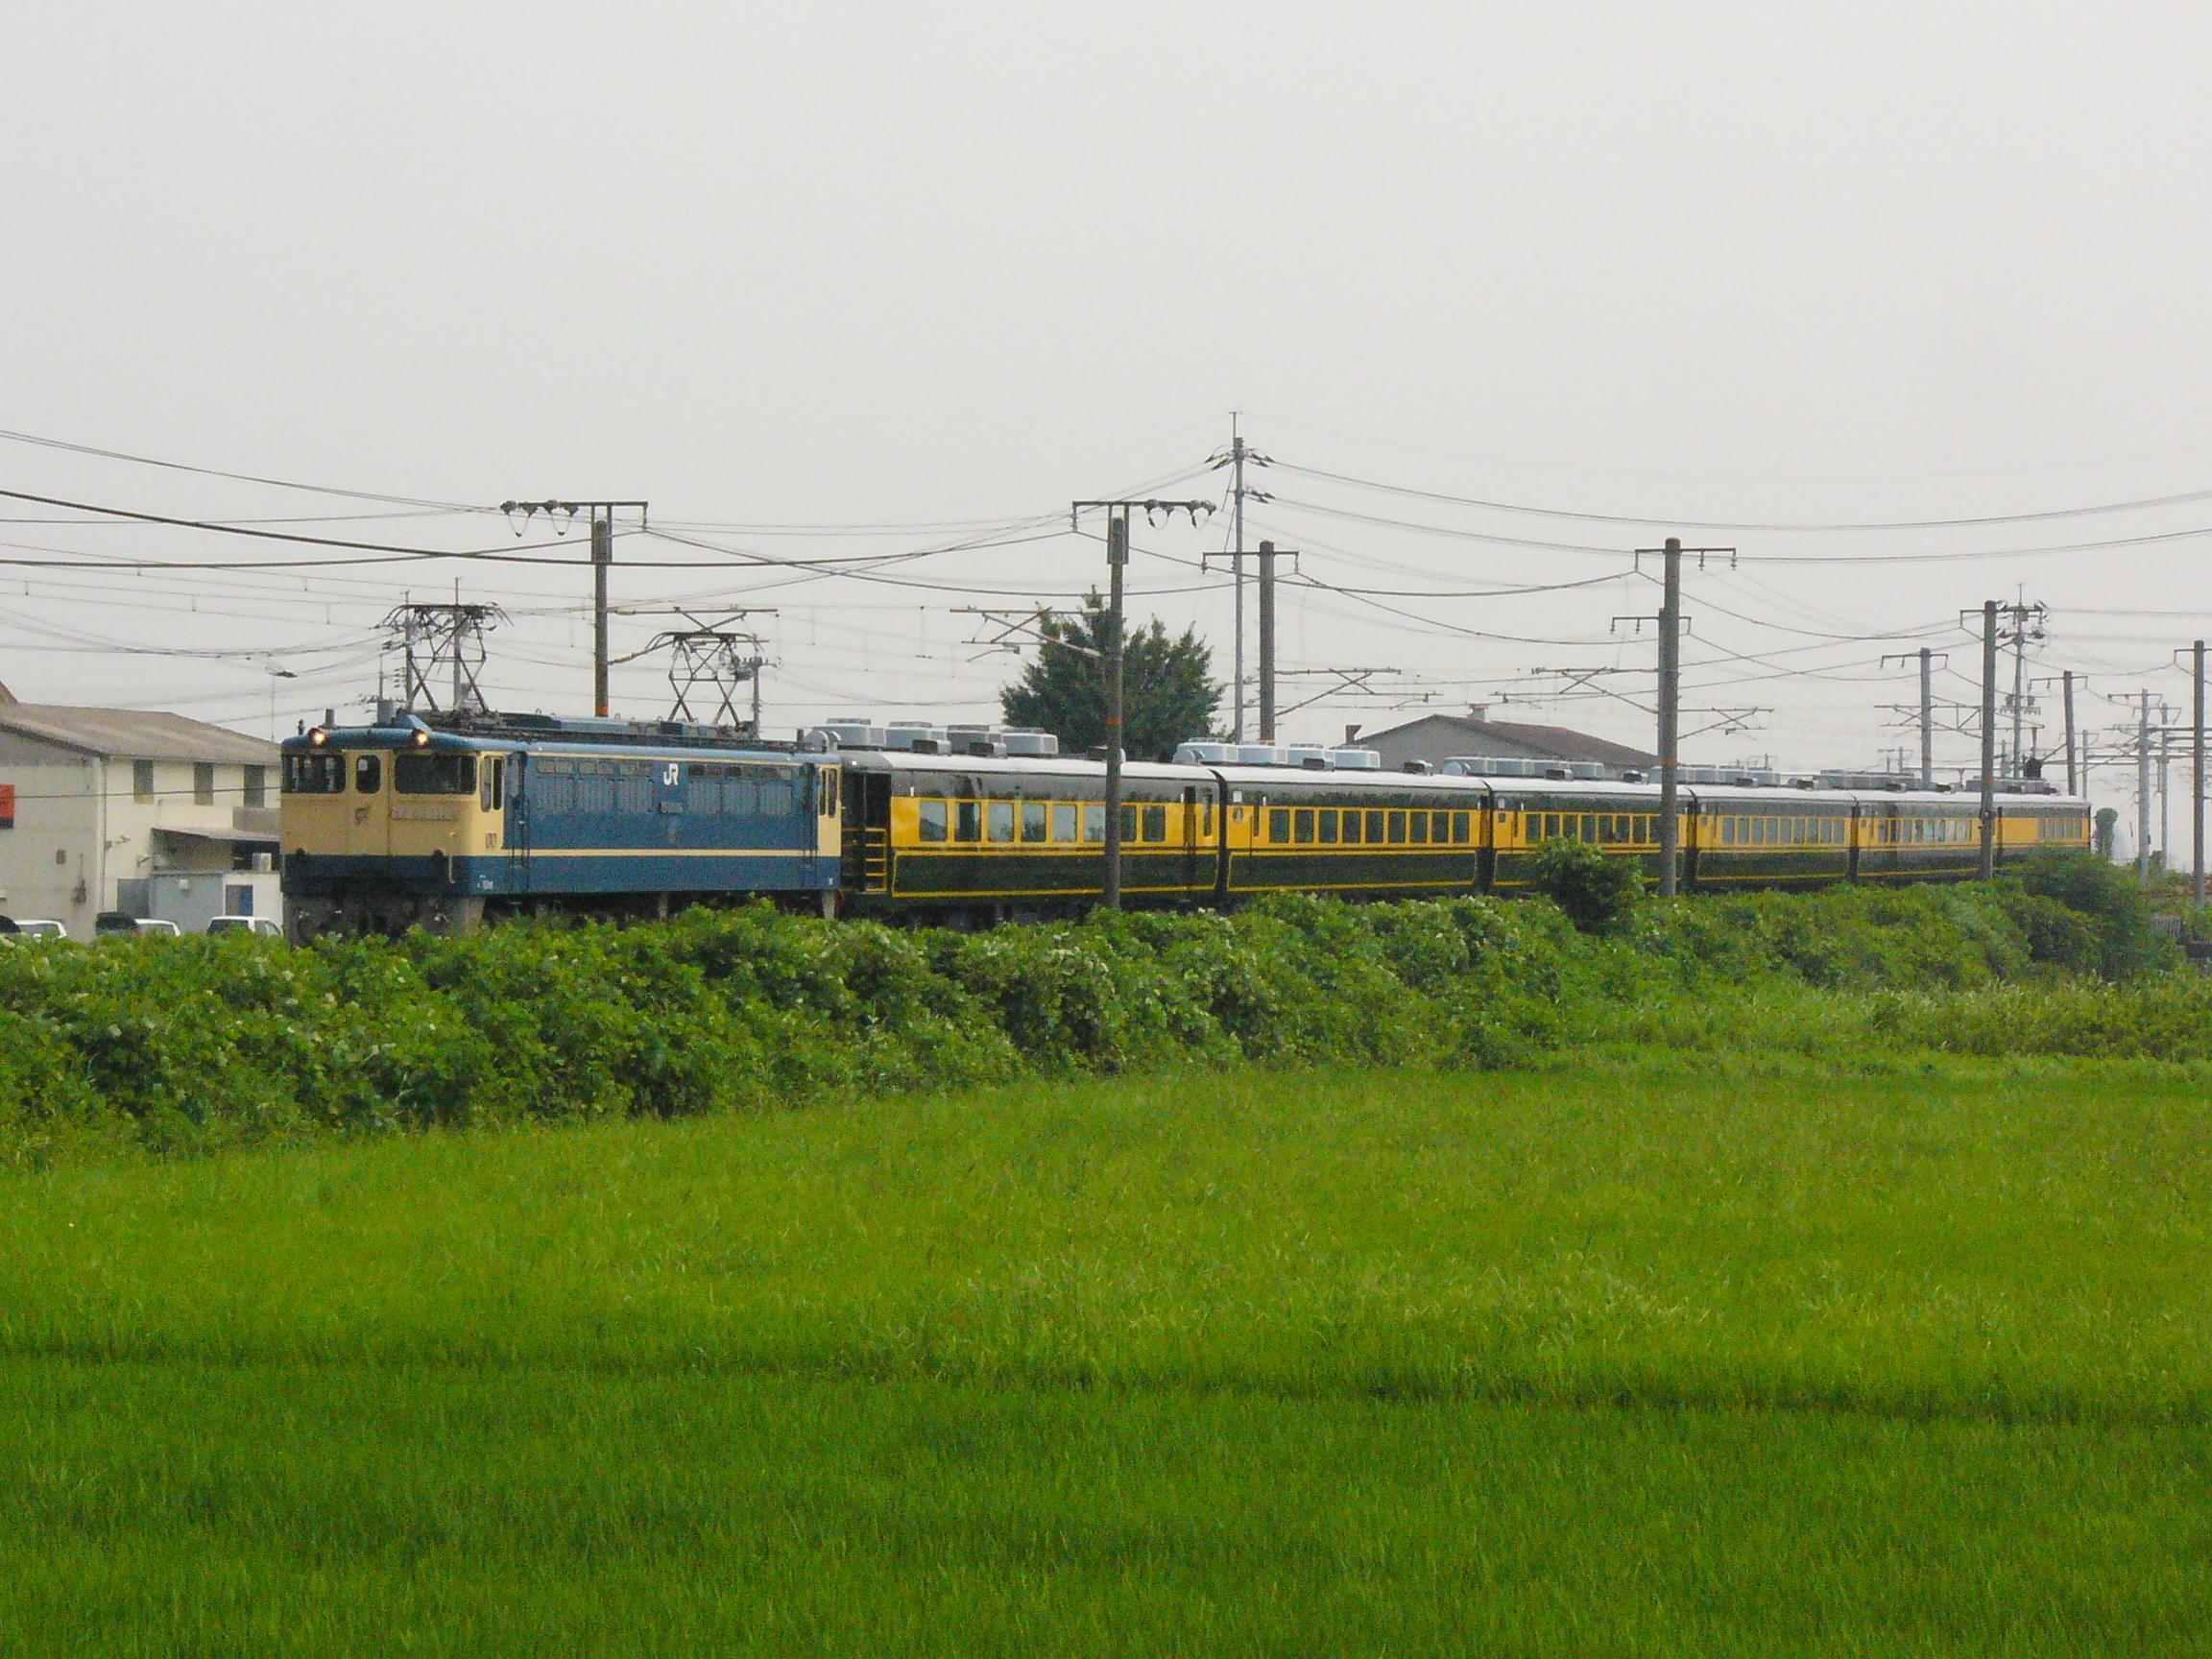 P1240279.jpg